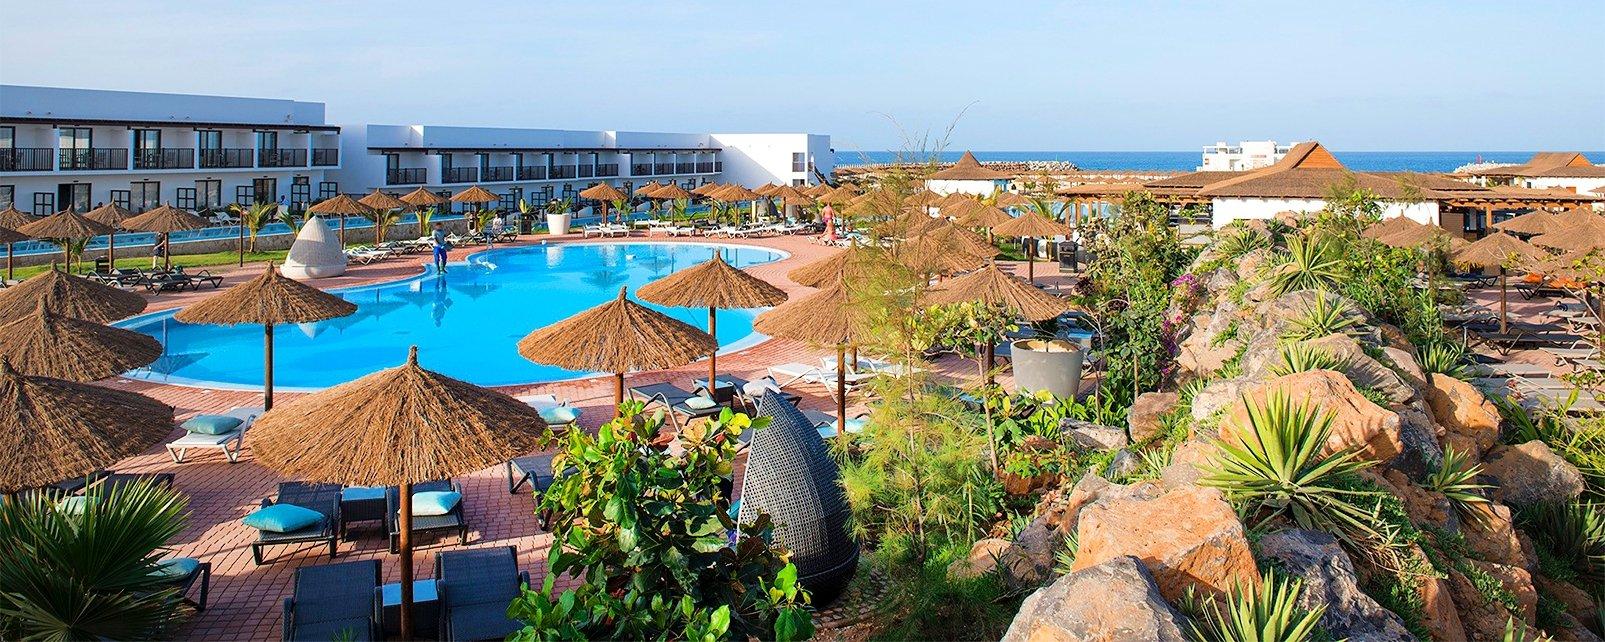 TUI Sensimar Cabo Verde Resort & Spa